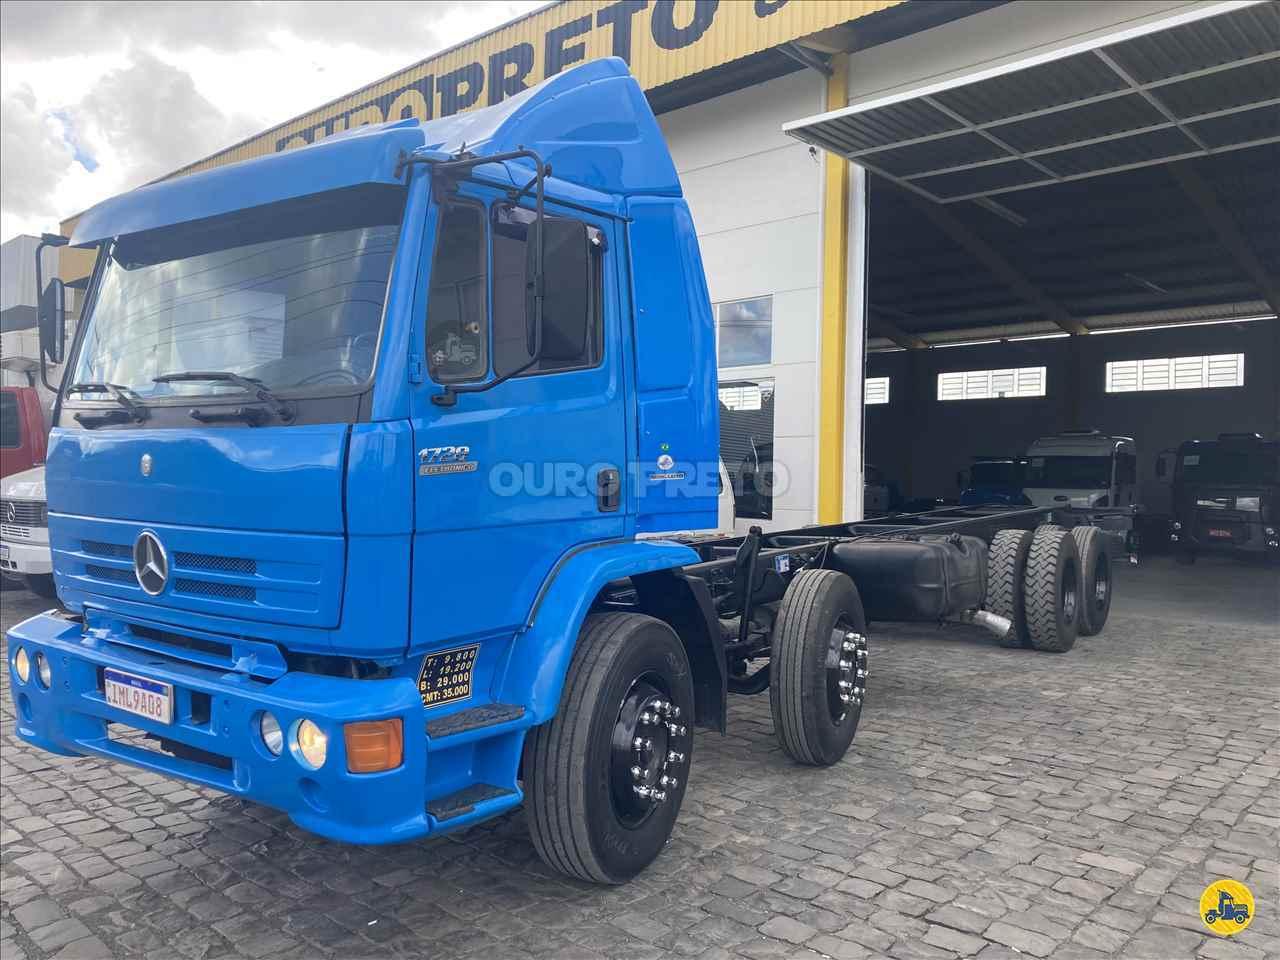 CAMINHAO MERCEDES-BENZ MB 2428 Chassis BiTruck 8x2 Ouro Preto Caminhões LAGES SANTA CATARINA SC